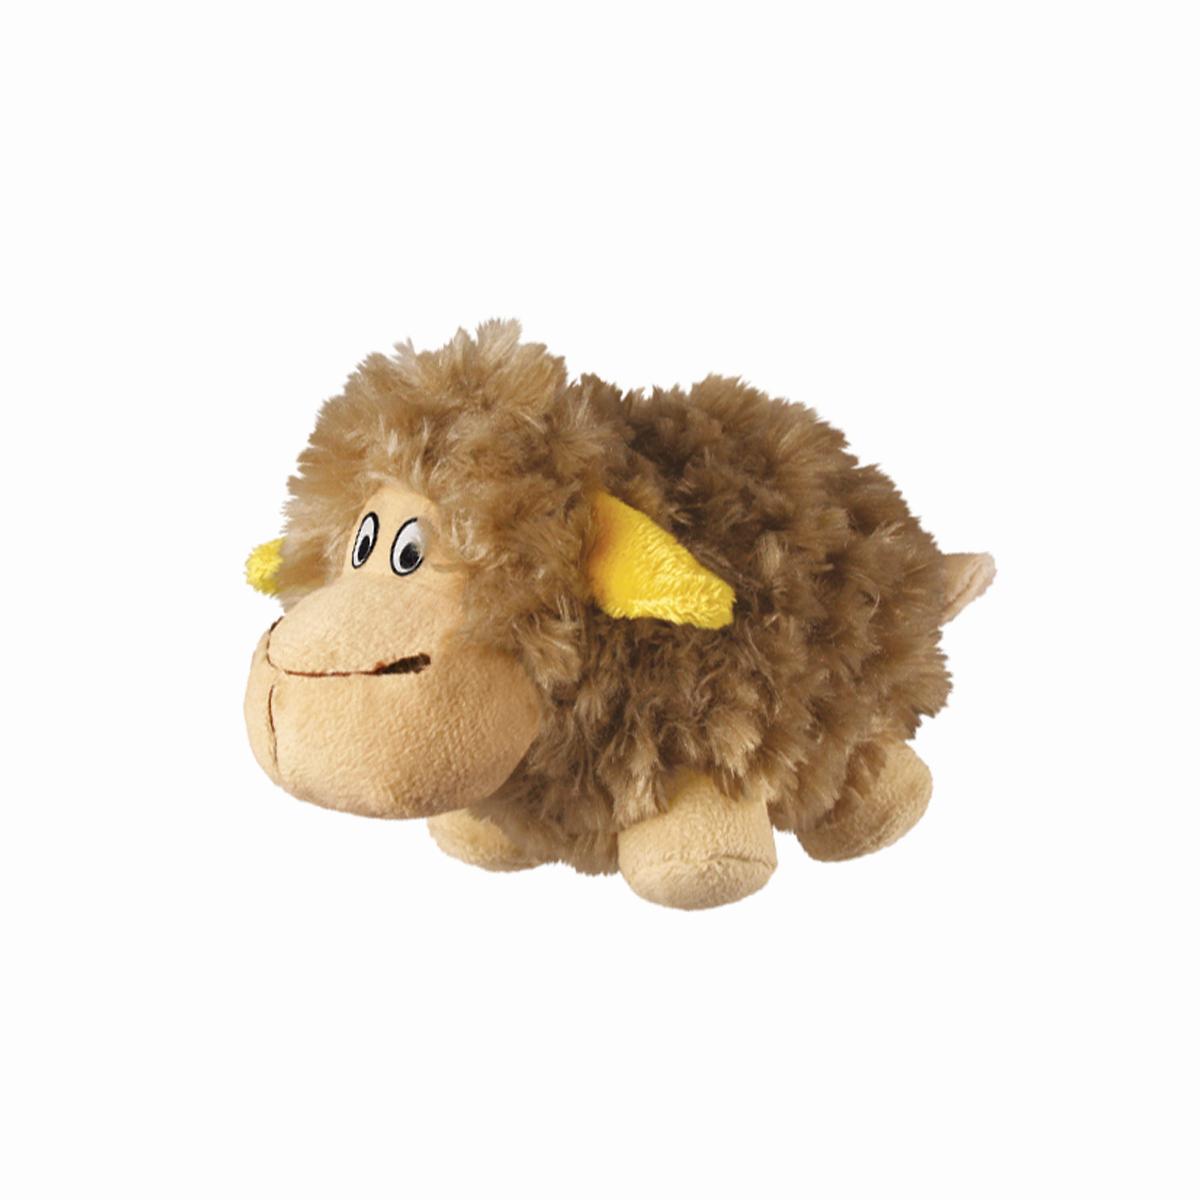 KO BARNYARD CRUNCHEEZ SHEEP L 00001